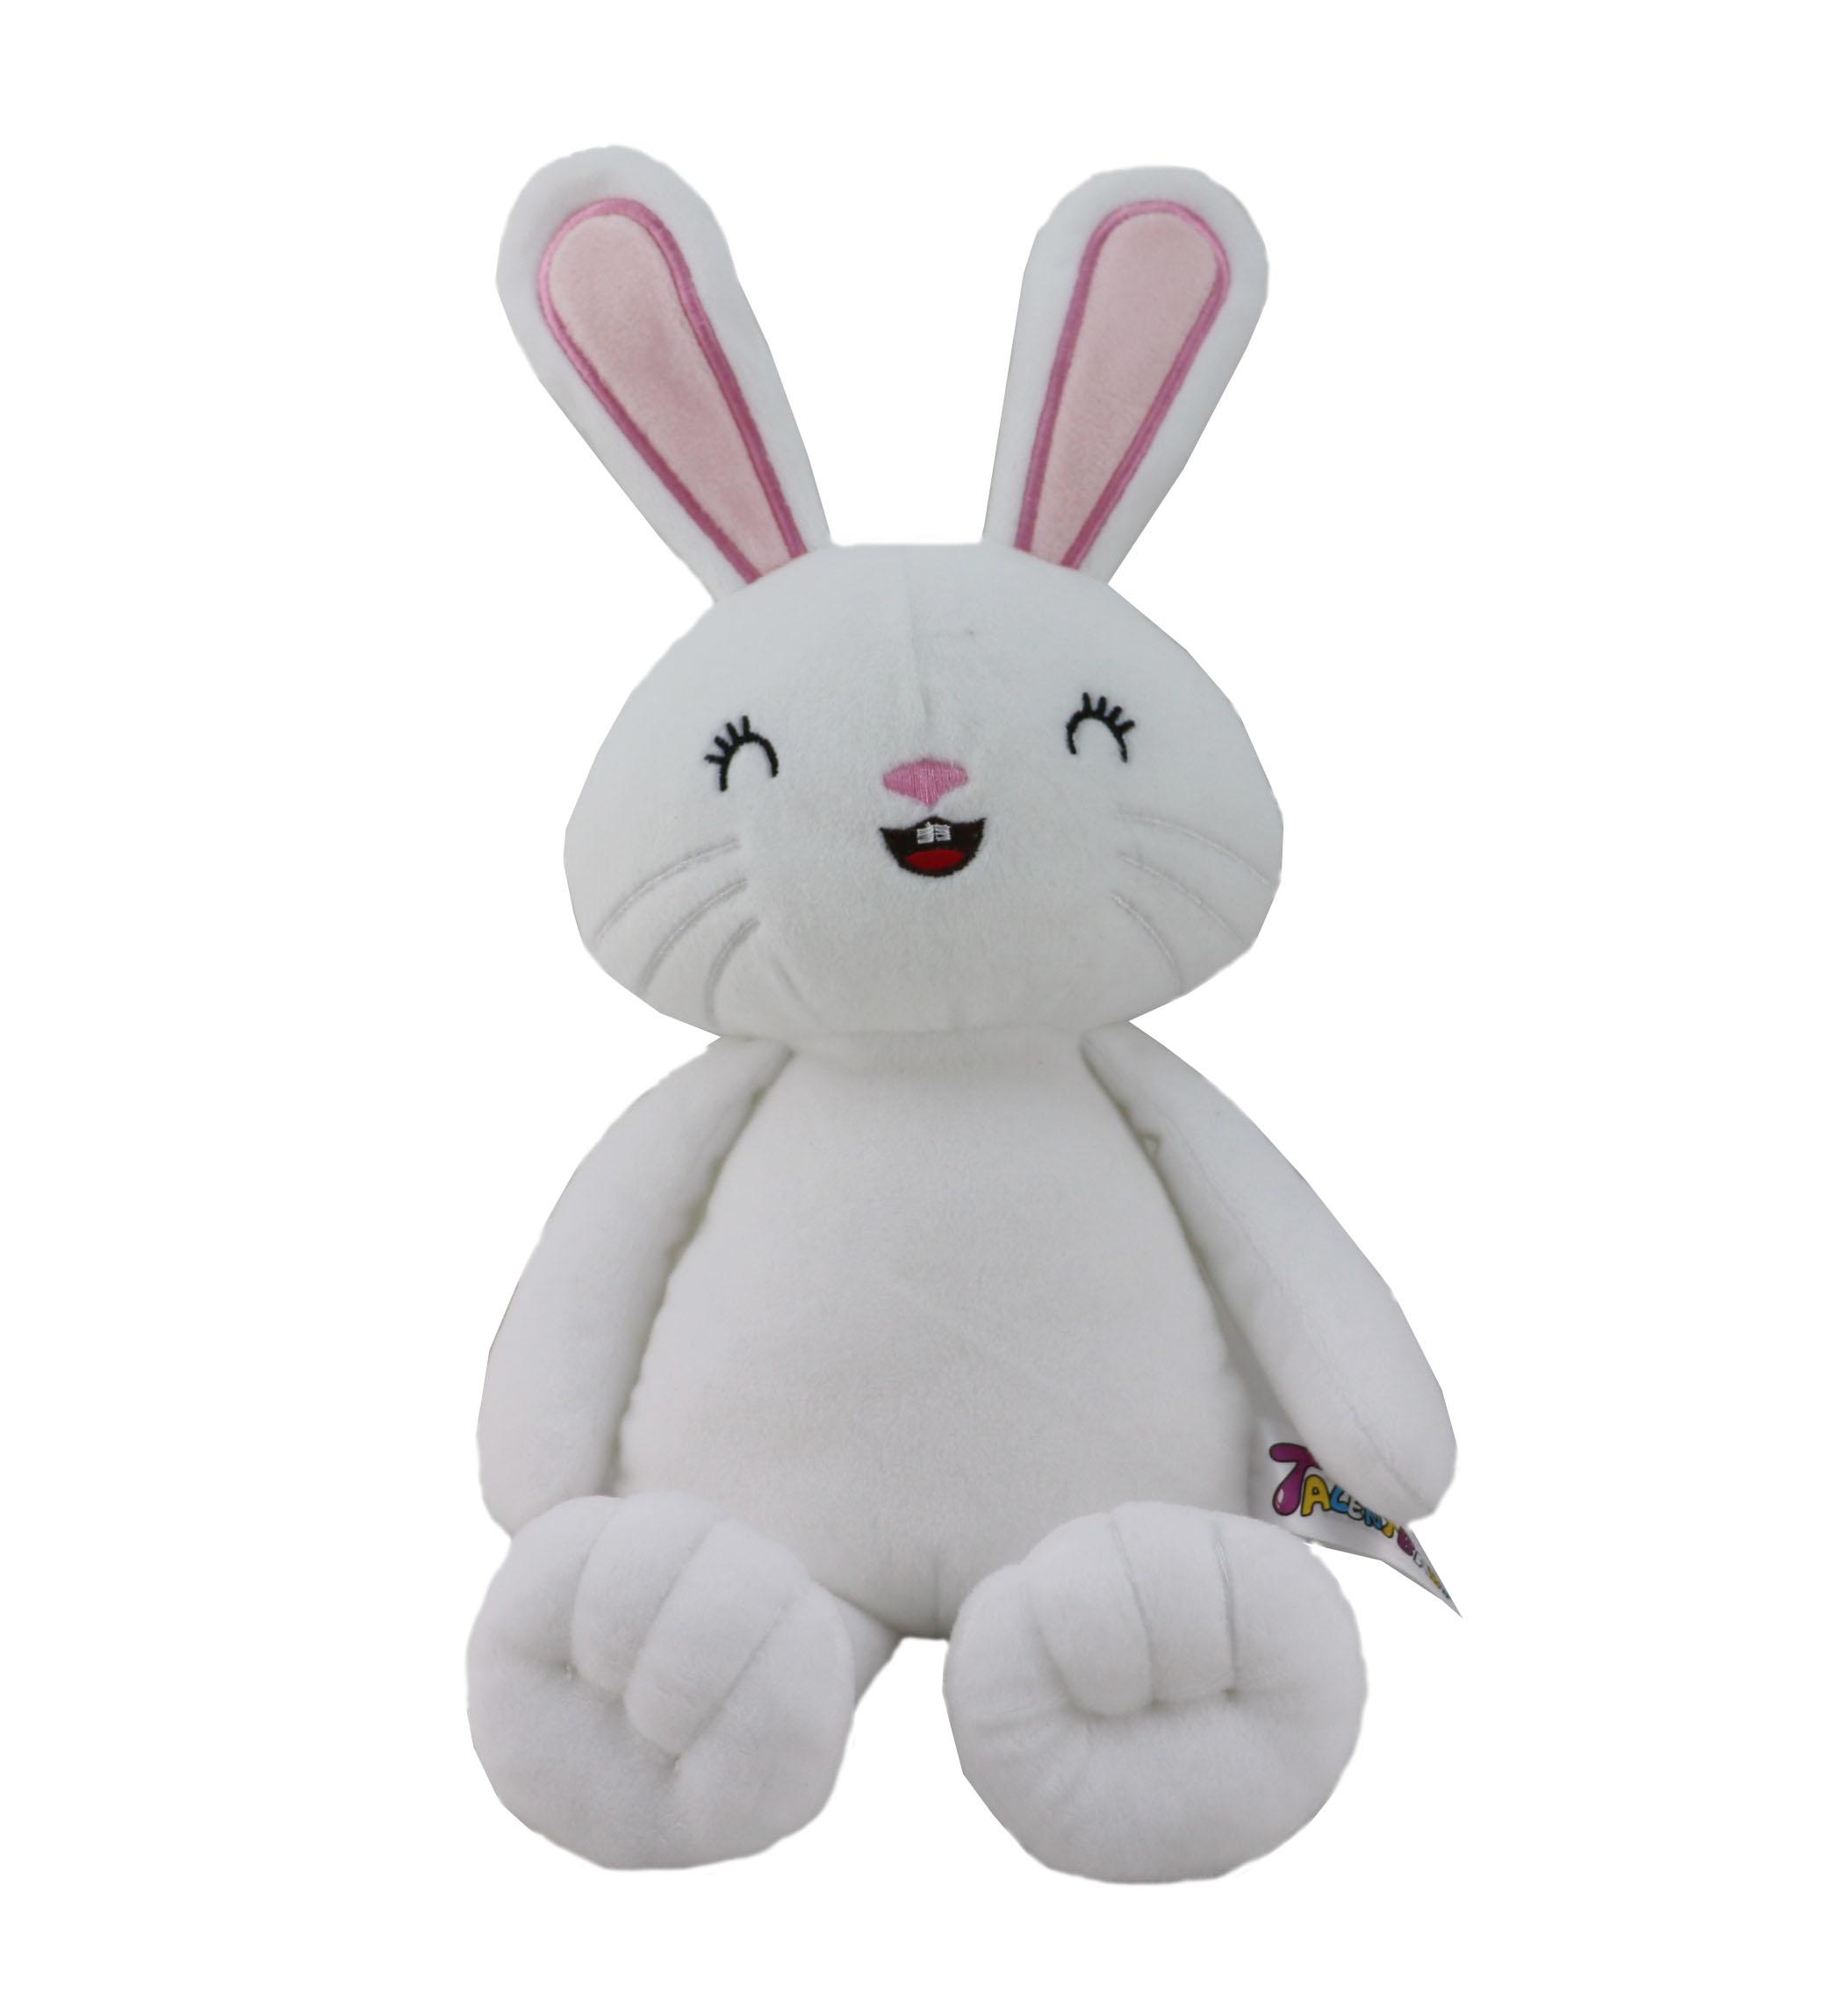 ICTI factory stuffed soft toy plush animal rabbit toy